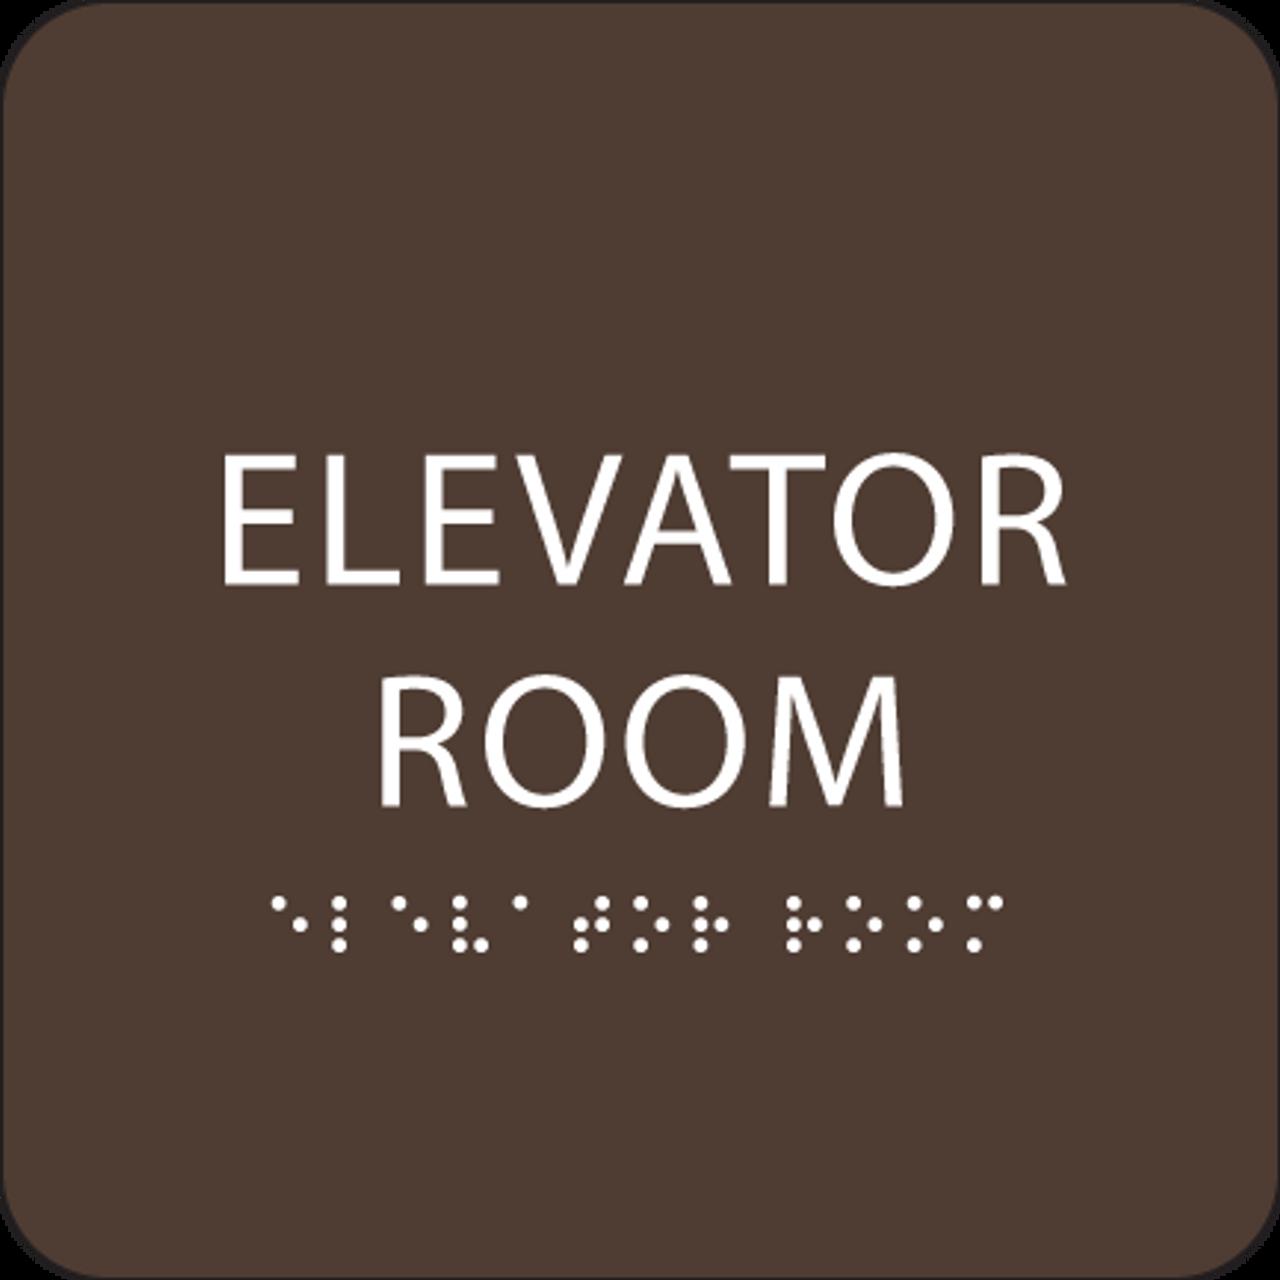 Dark Brown Elevator Room ADA Sign